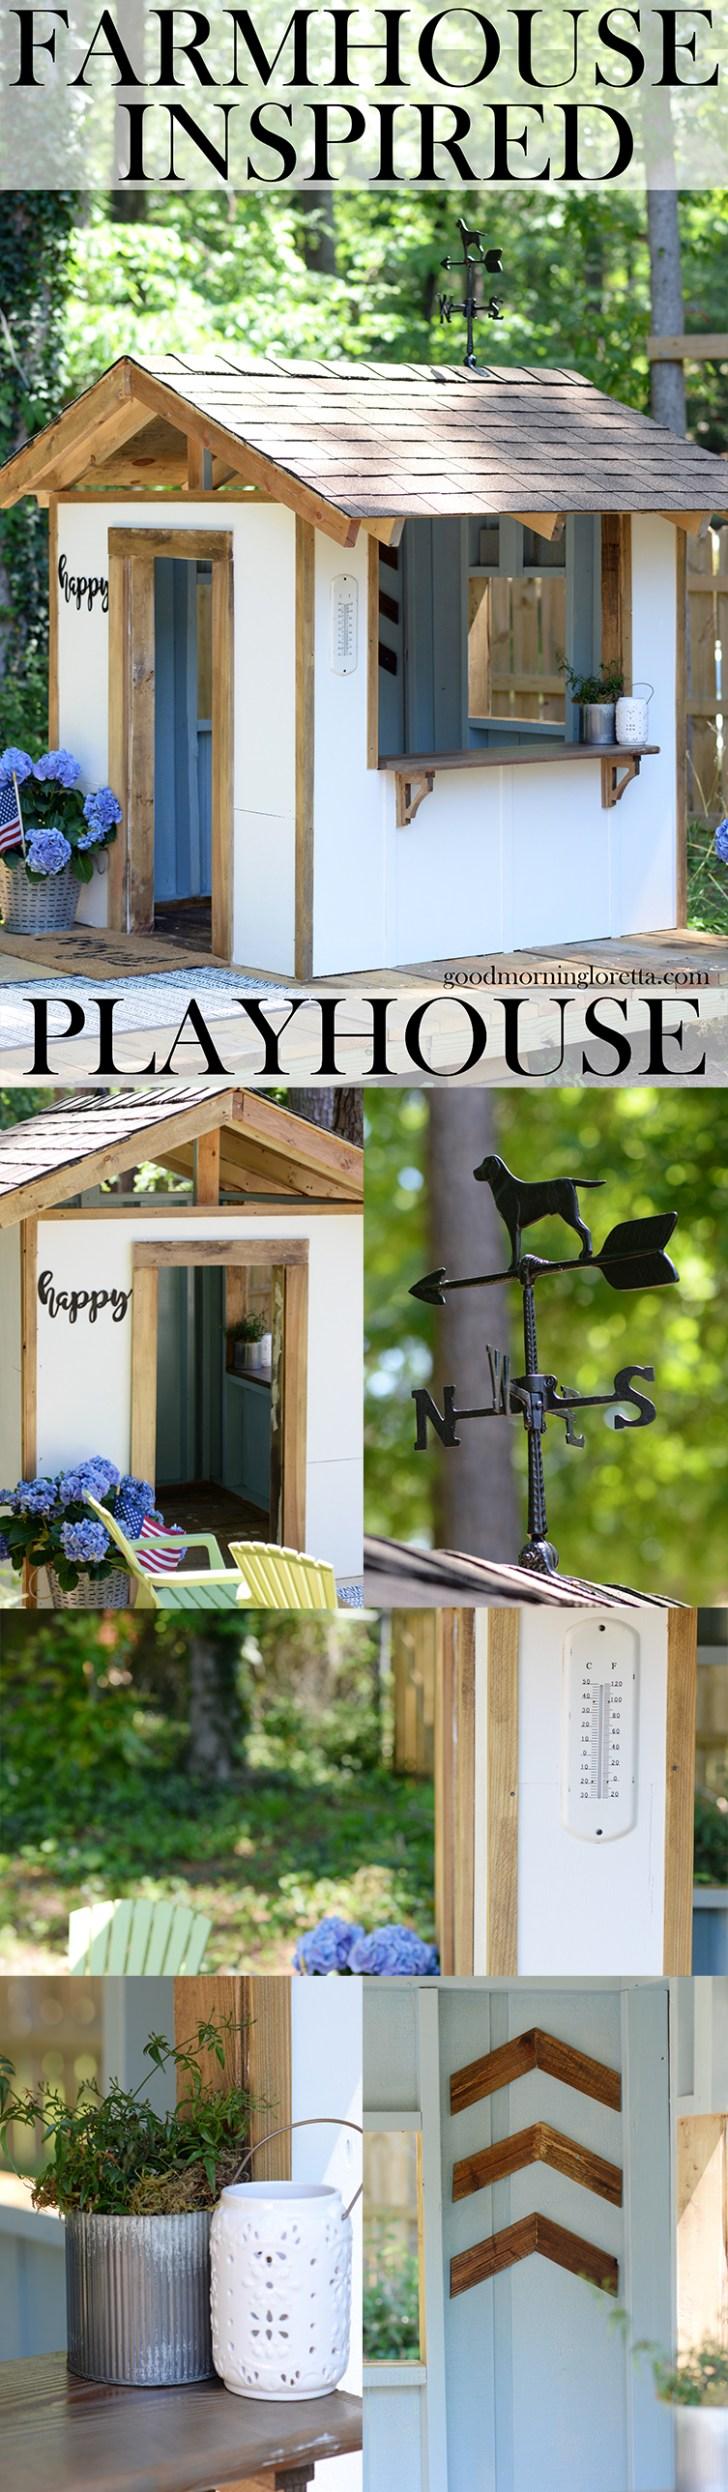 diy farmhouse style playhouse plans part 3 of 3 u2013 good morning